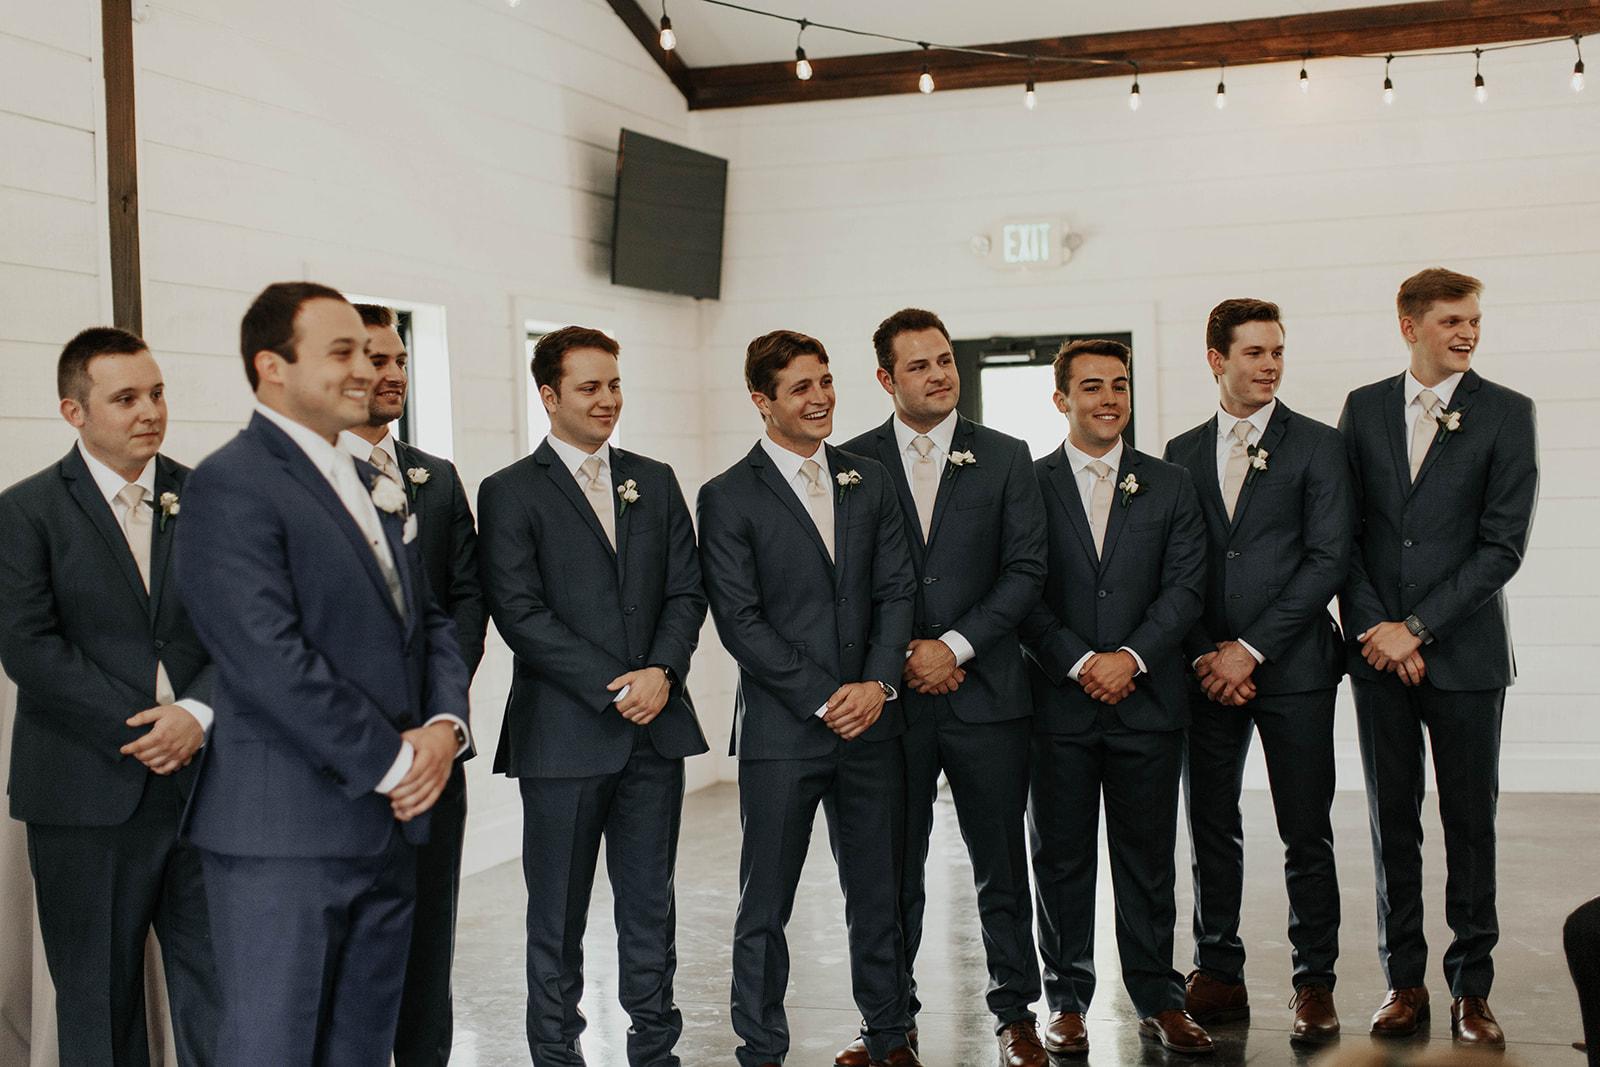 Tulsa Bixby Oklahoma Best Wedding and Reception Venue 12.jpg